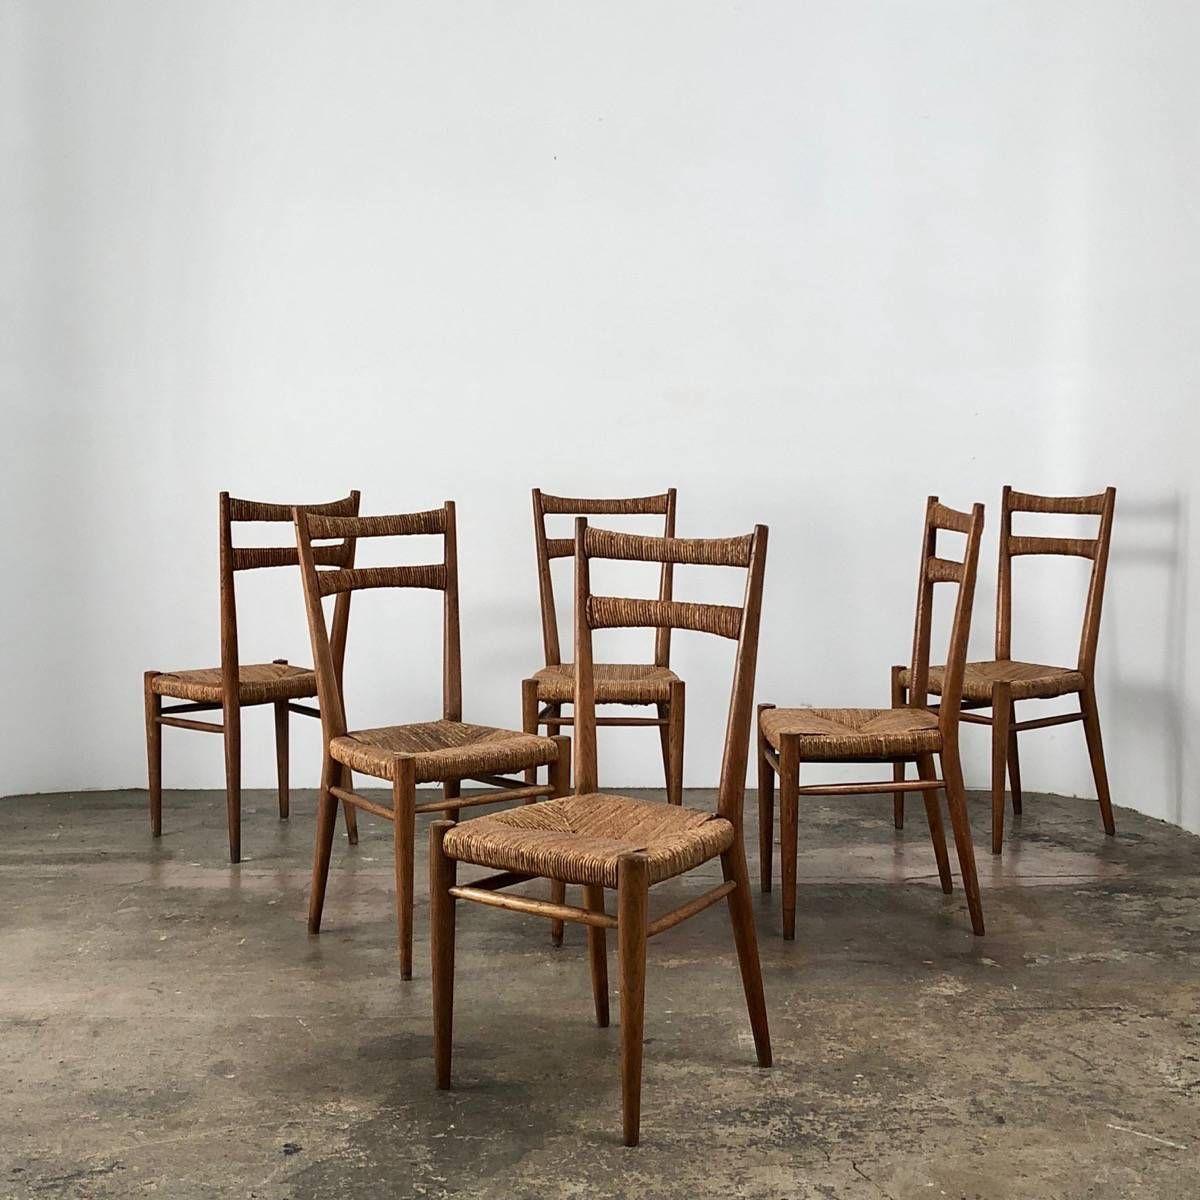 Genvieve Pons Vintage Chairs Objet